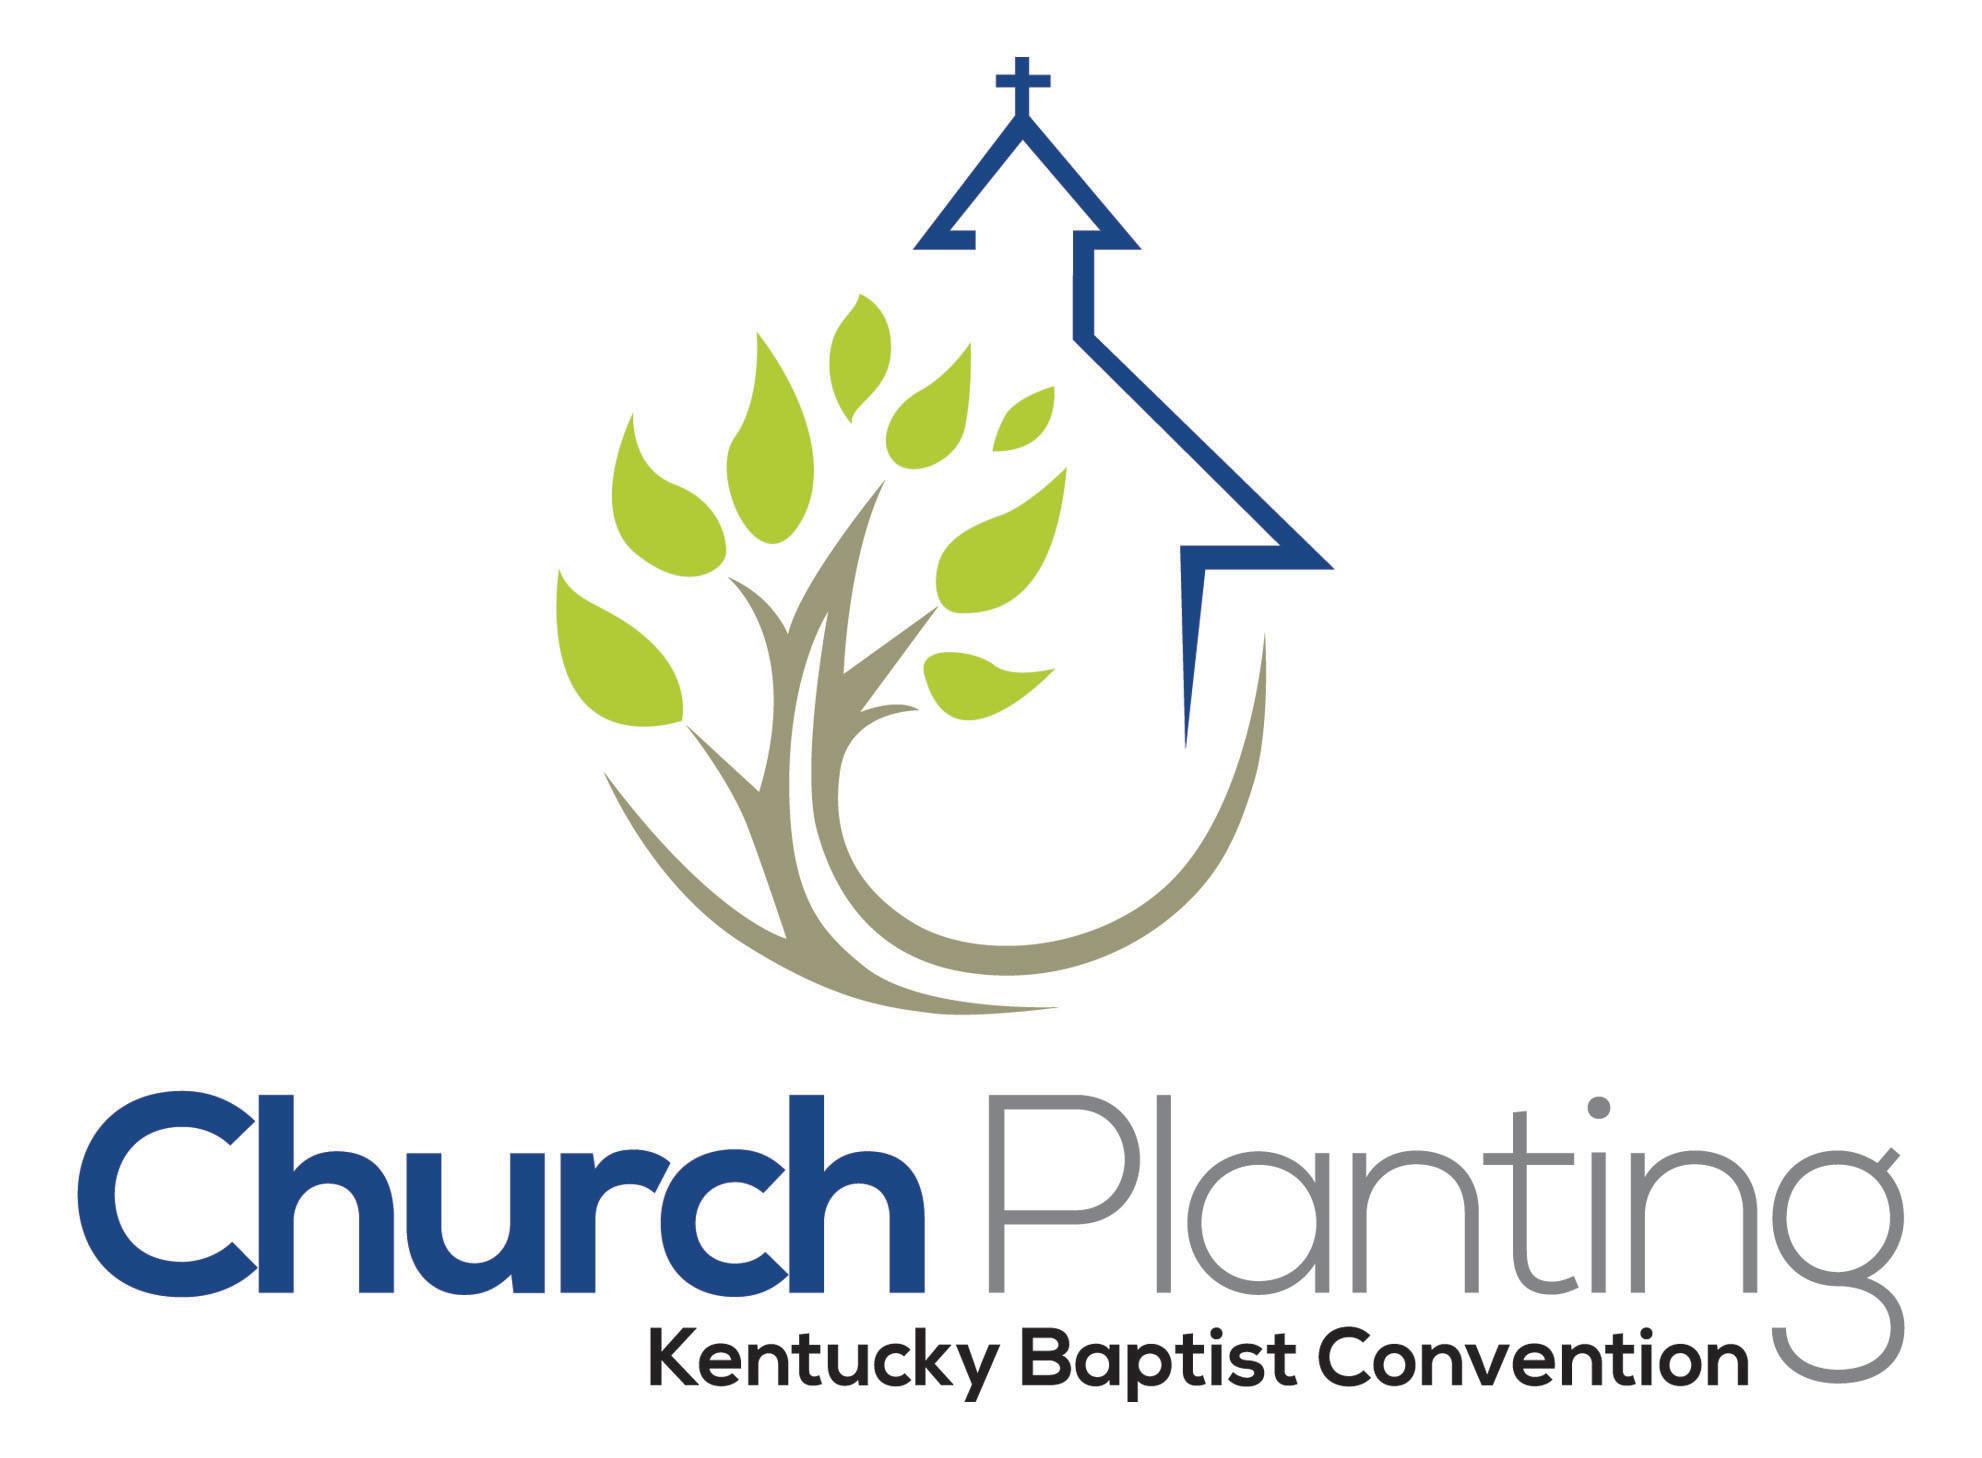 Church Planting   Kentucky Baptist Convention